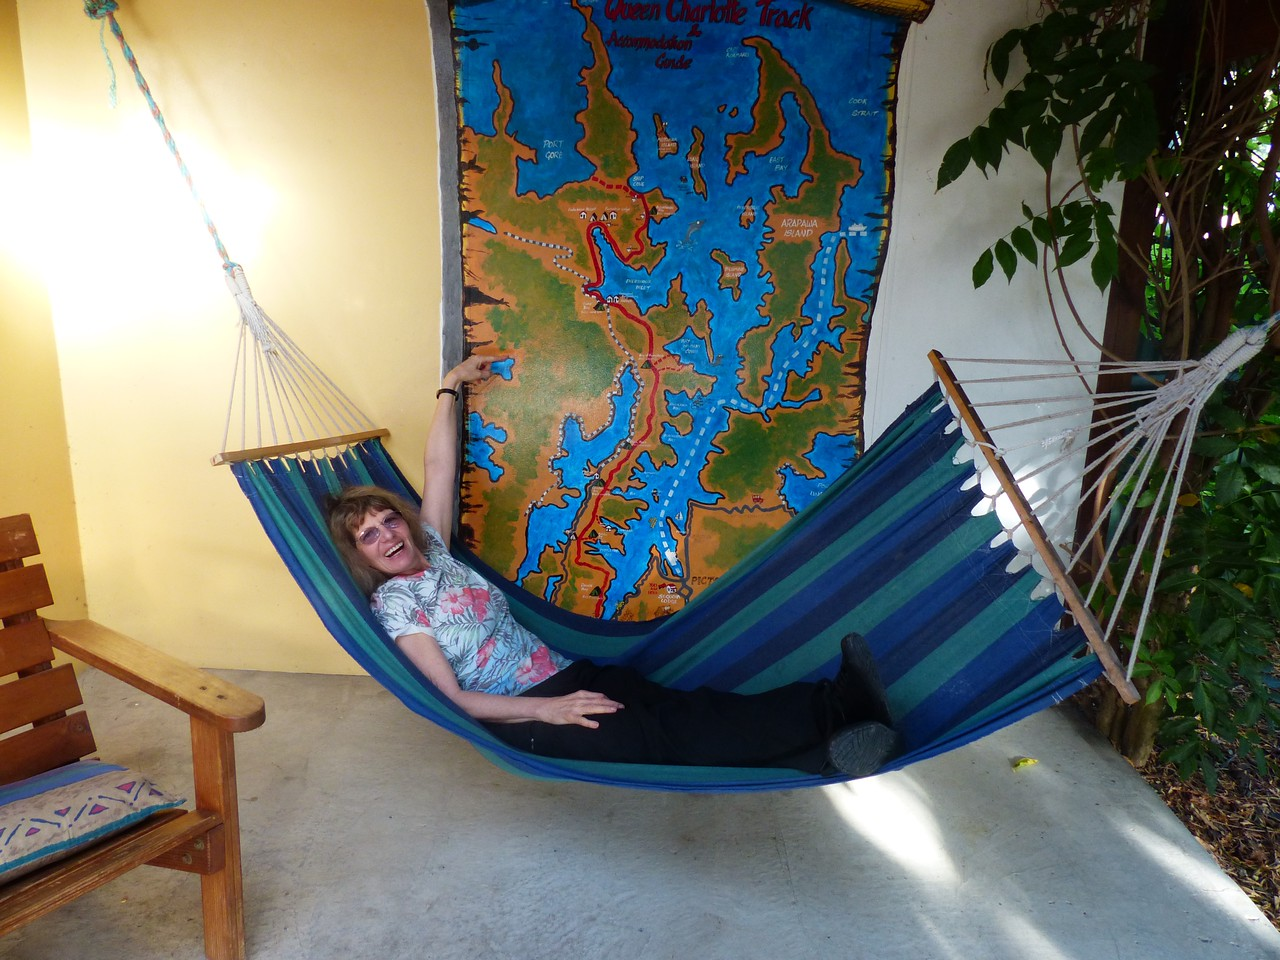 And a hammock.